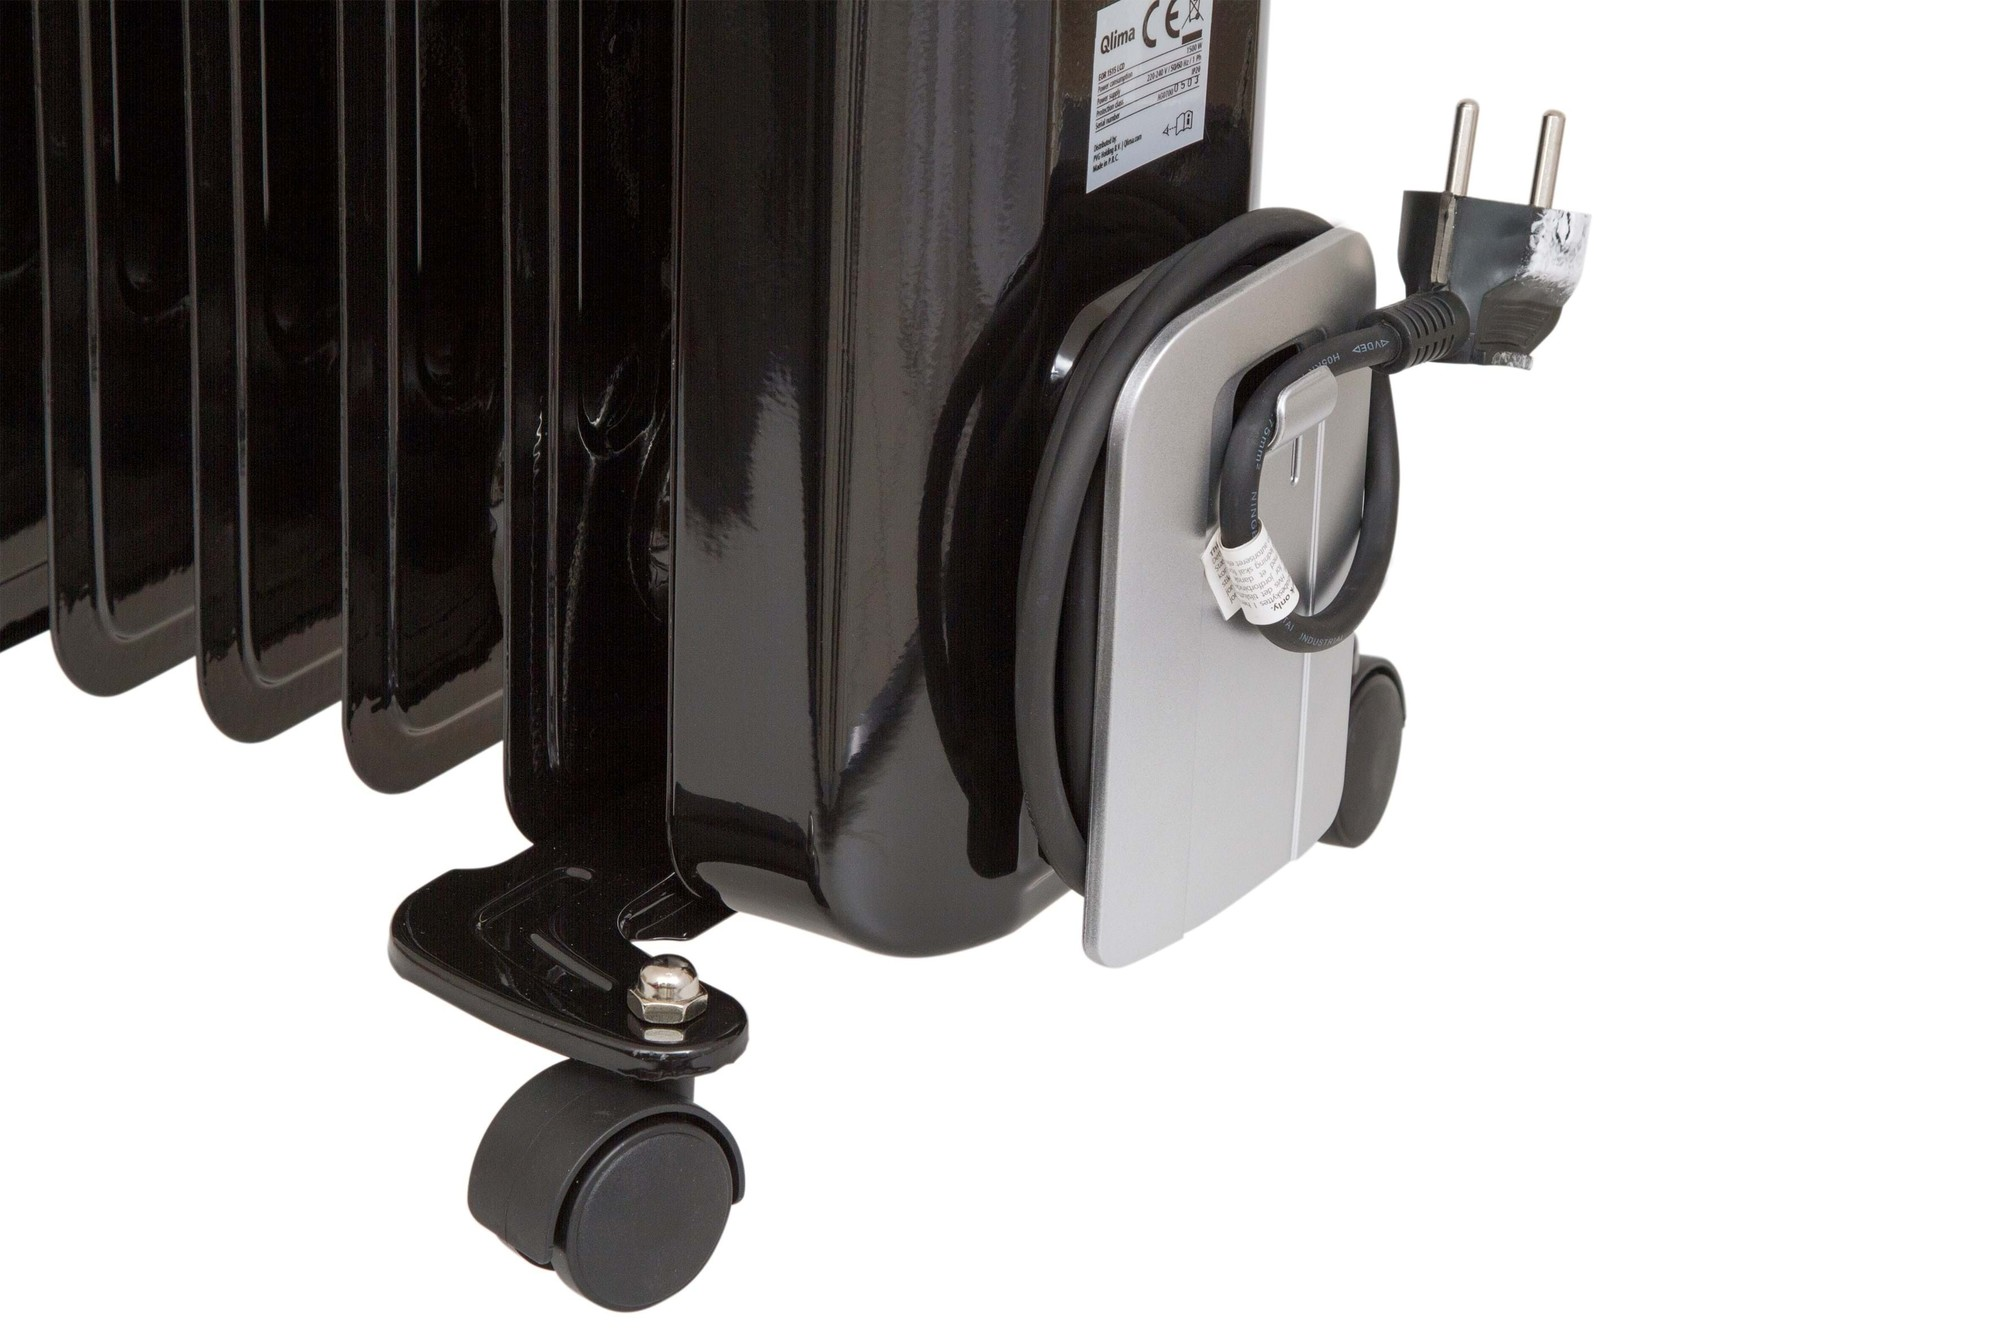 Qlima elektrische verwarming EOR 1515 LCD - 1500 W sfeer